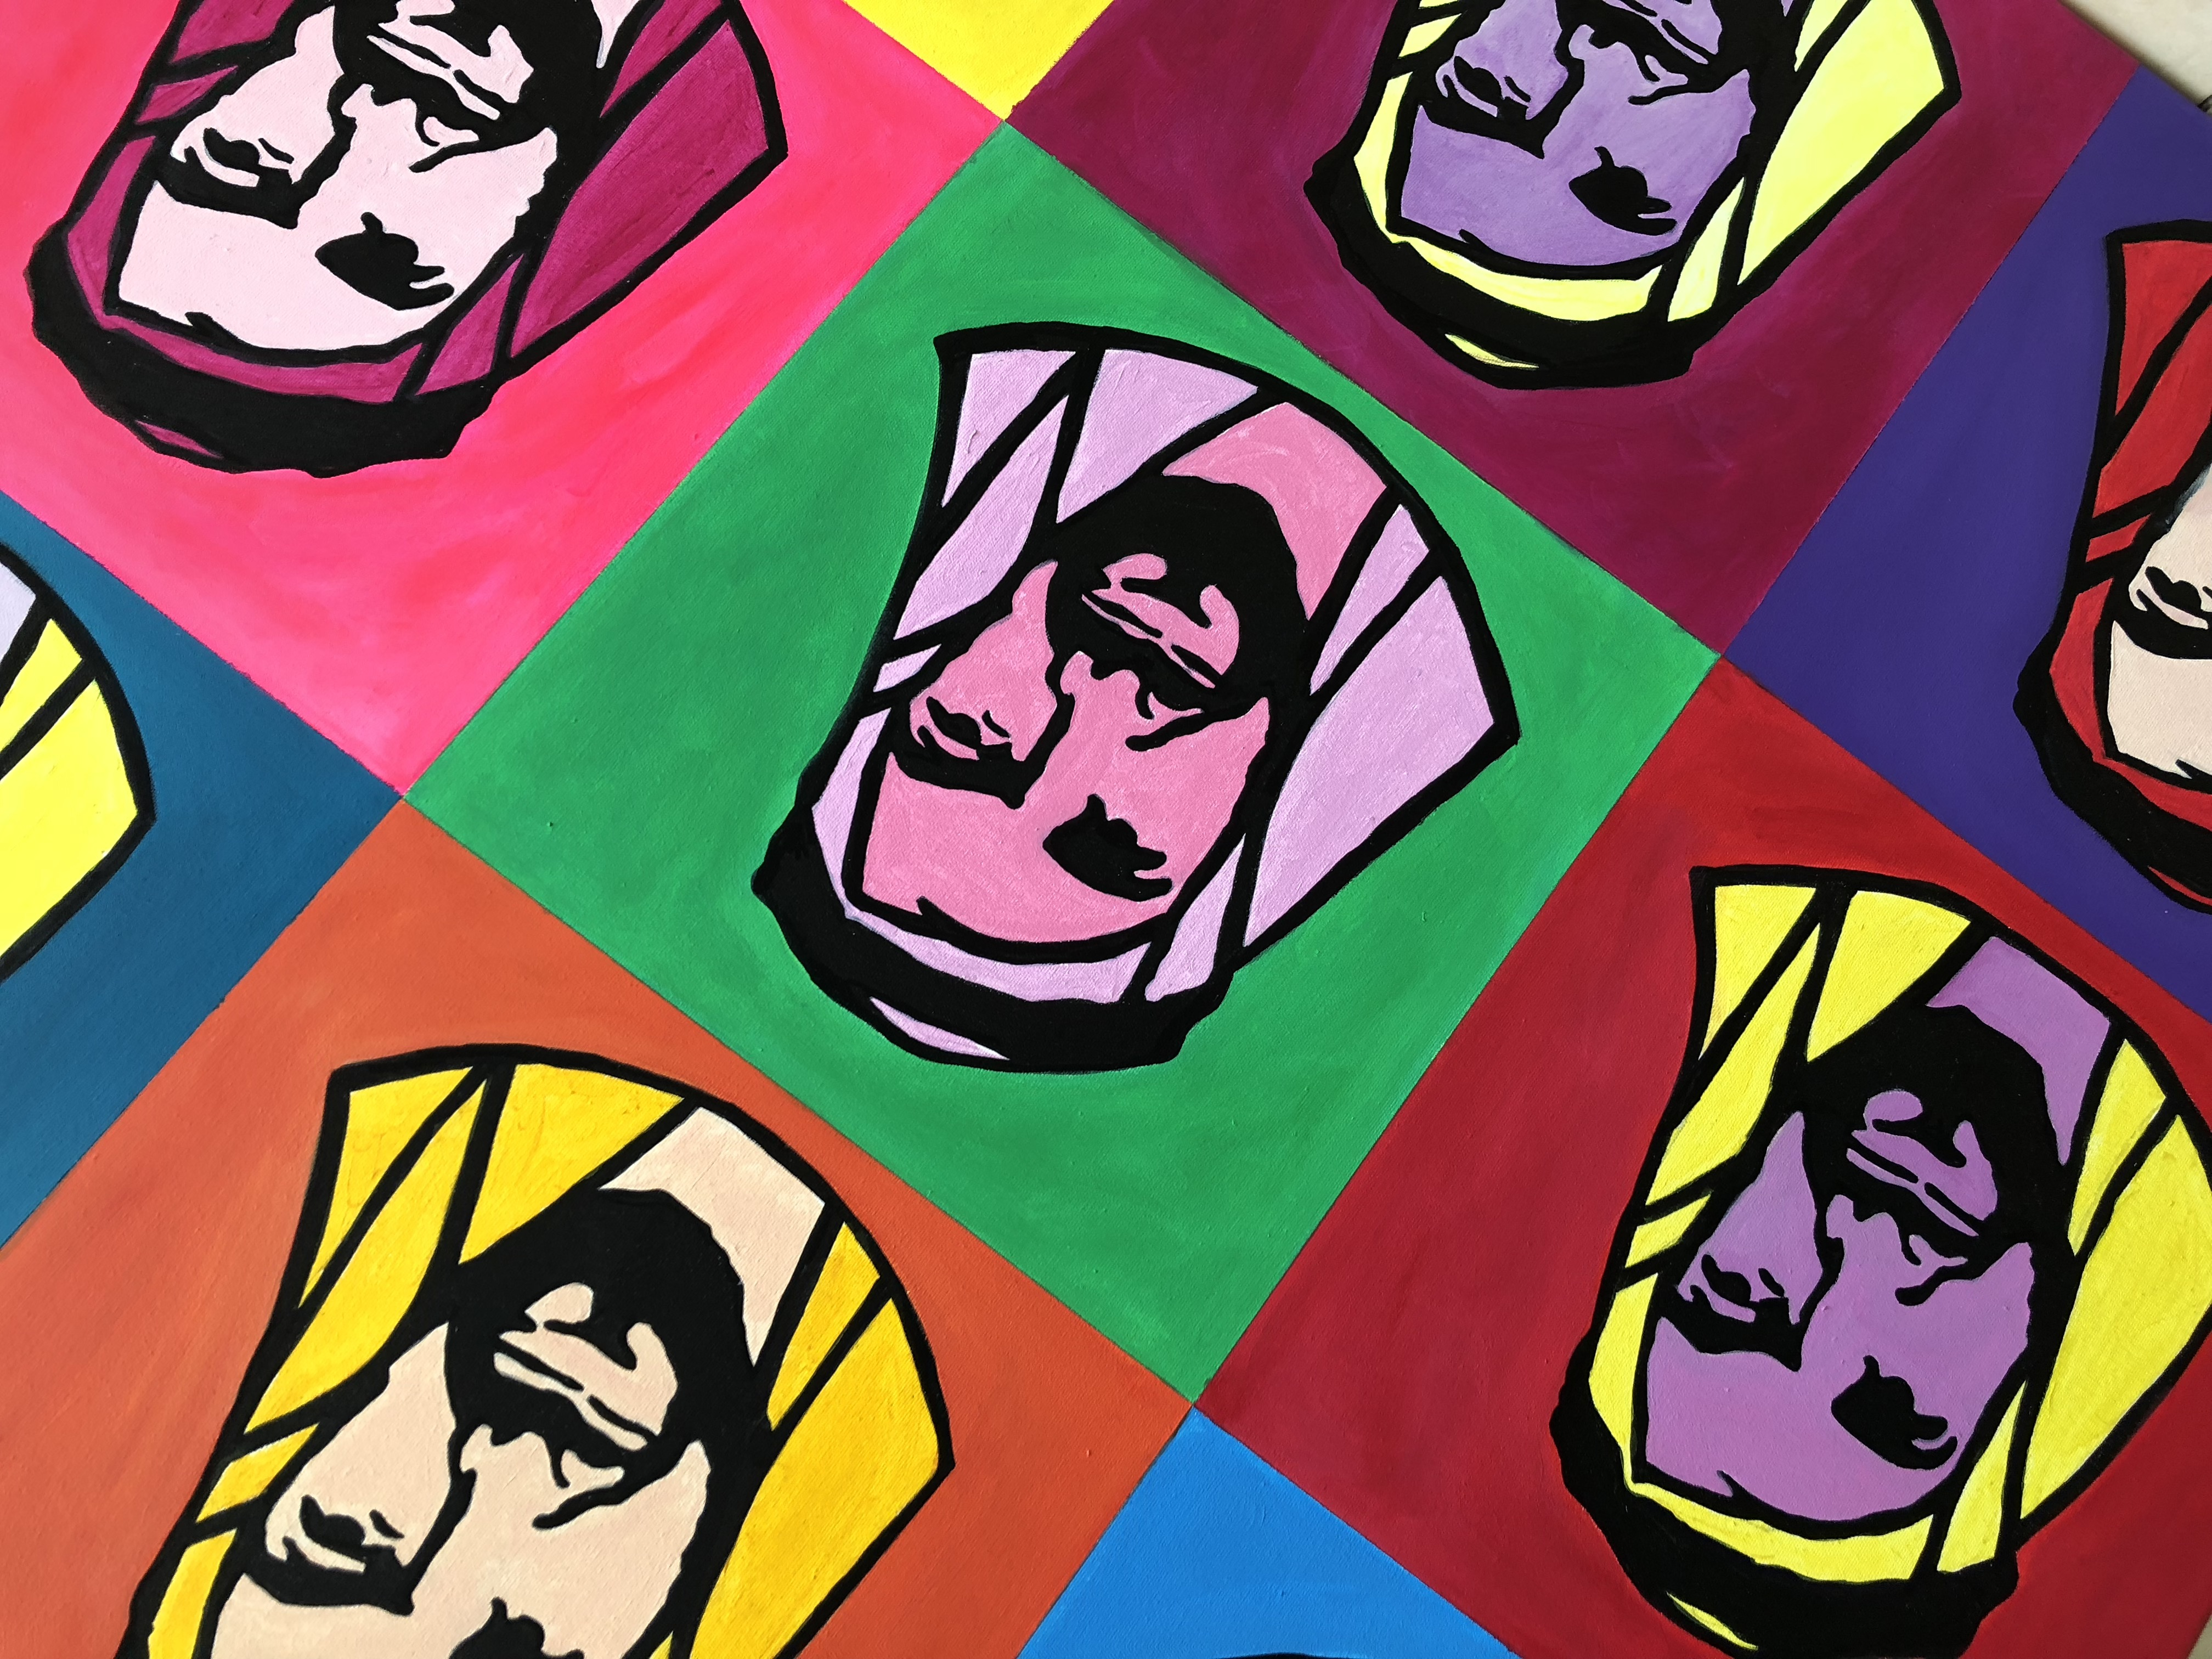 SHEIKH Z Natalie Daghestani Art Dubai Artist BSAB 6